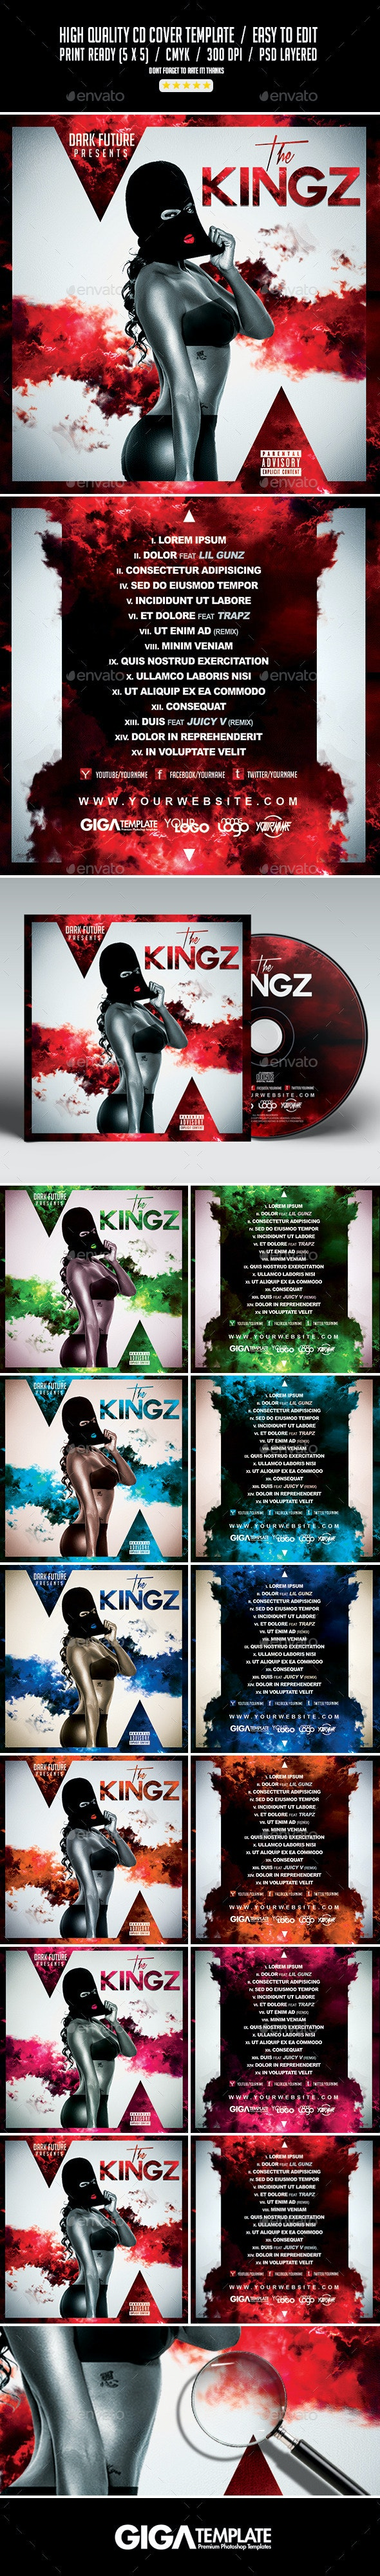 The Kingz | Mixtape Tape Album CD Cover Template - CD & DVD Artwork Print Templates